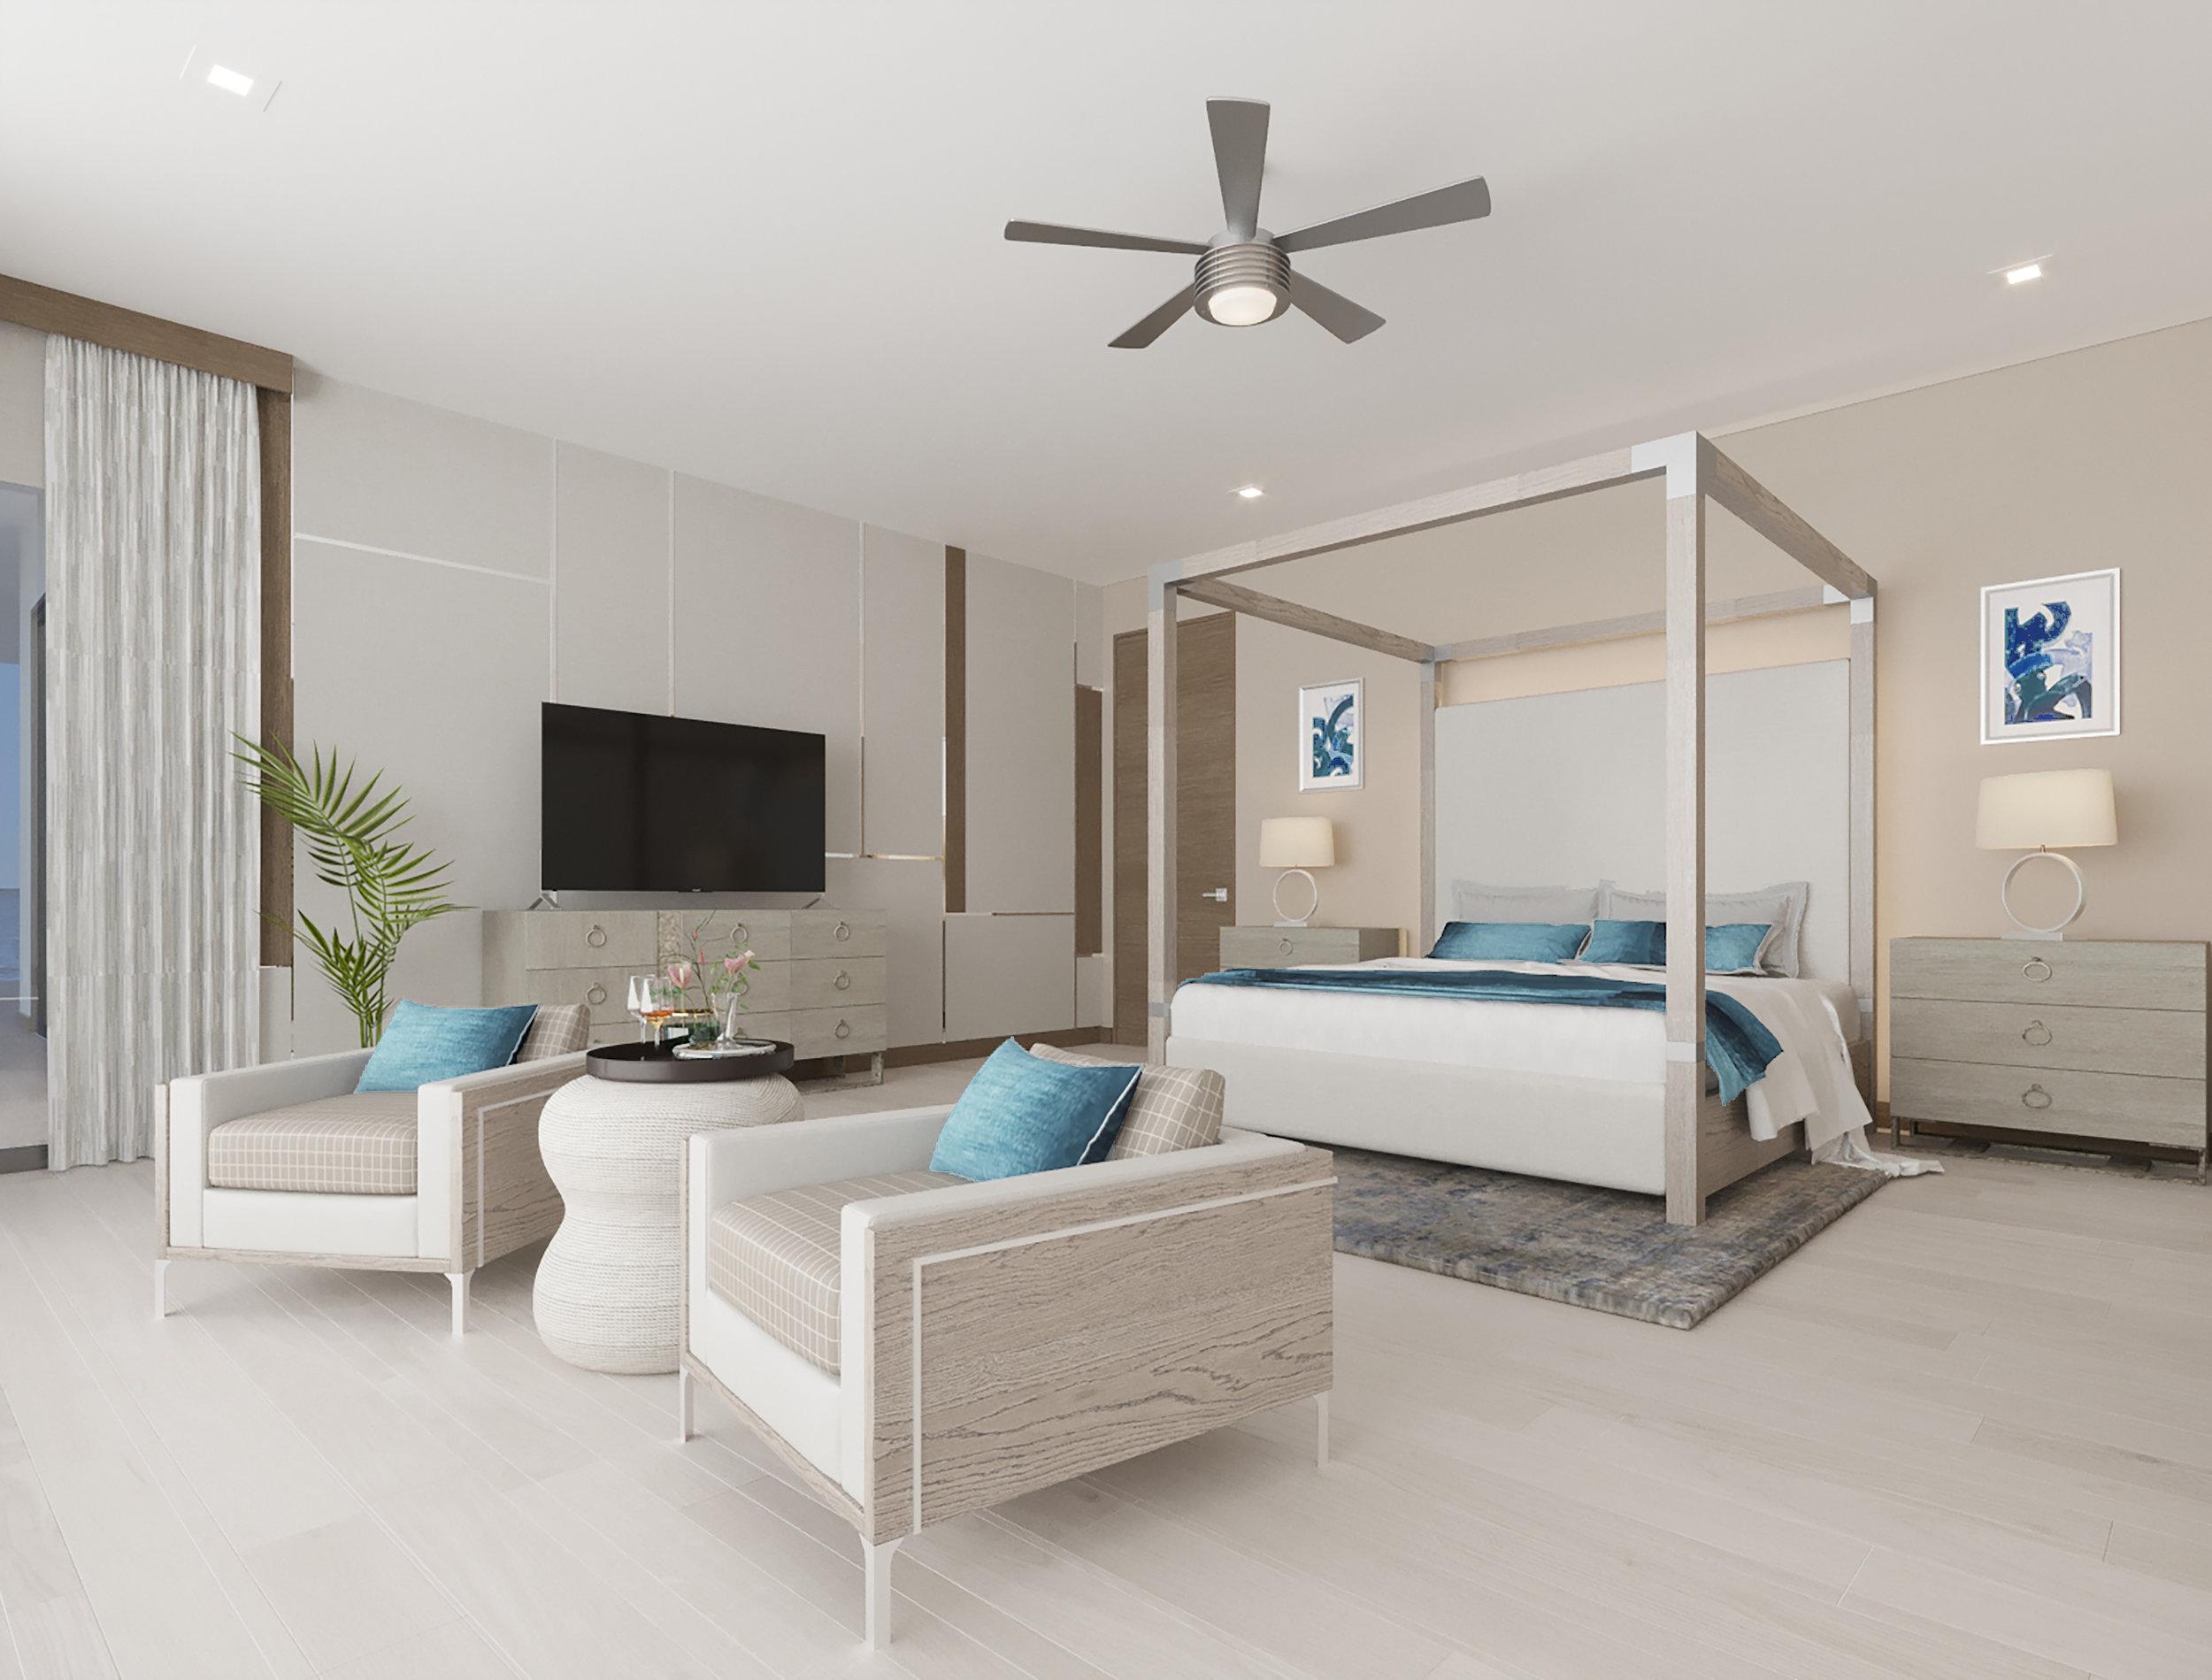 MAIN LEVEL: Master Bedroom